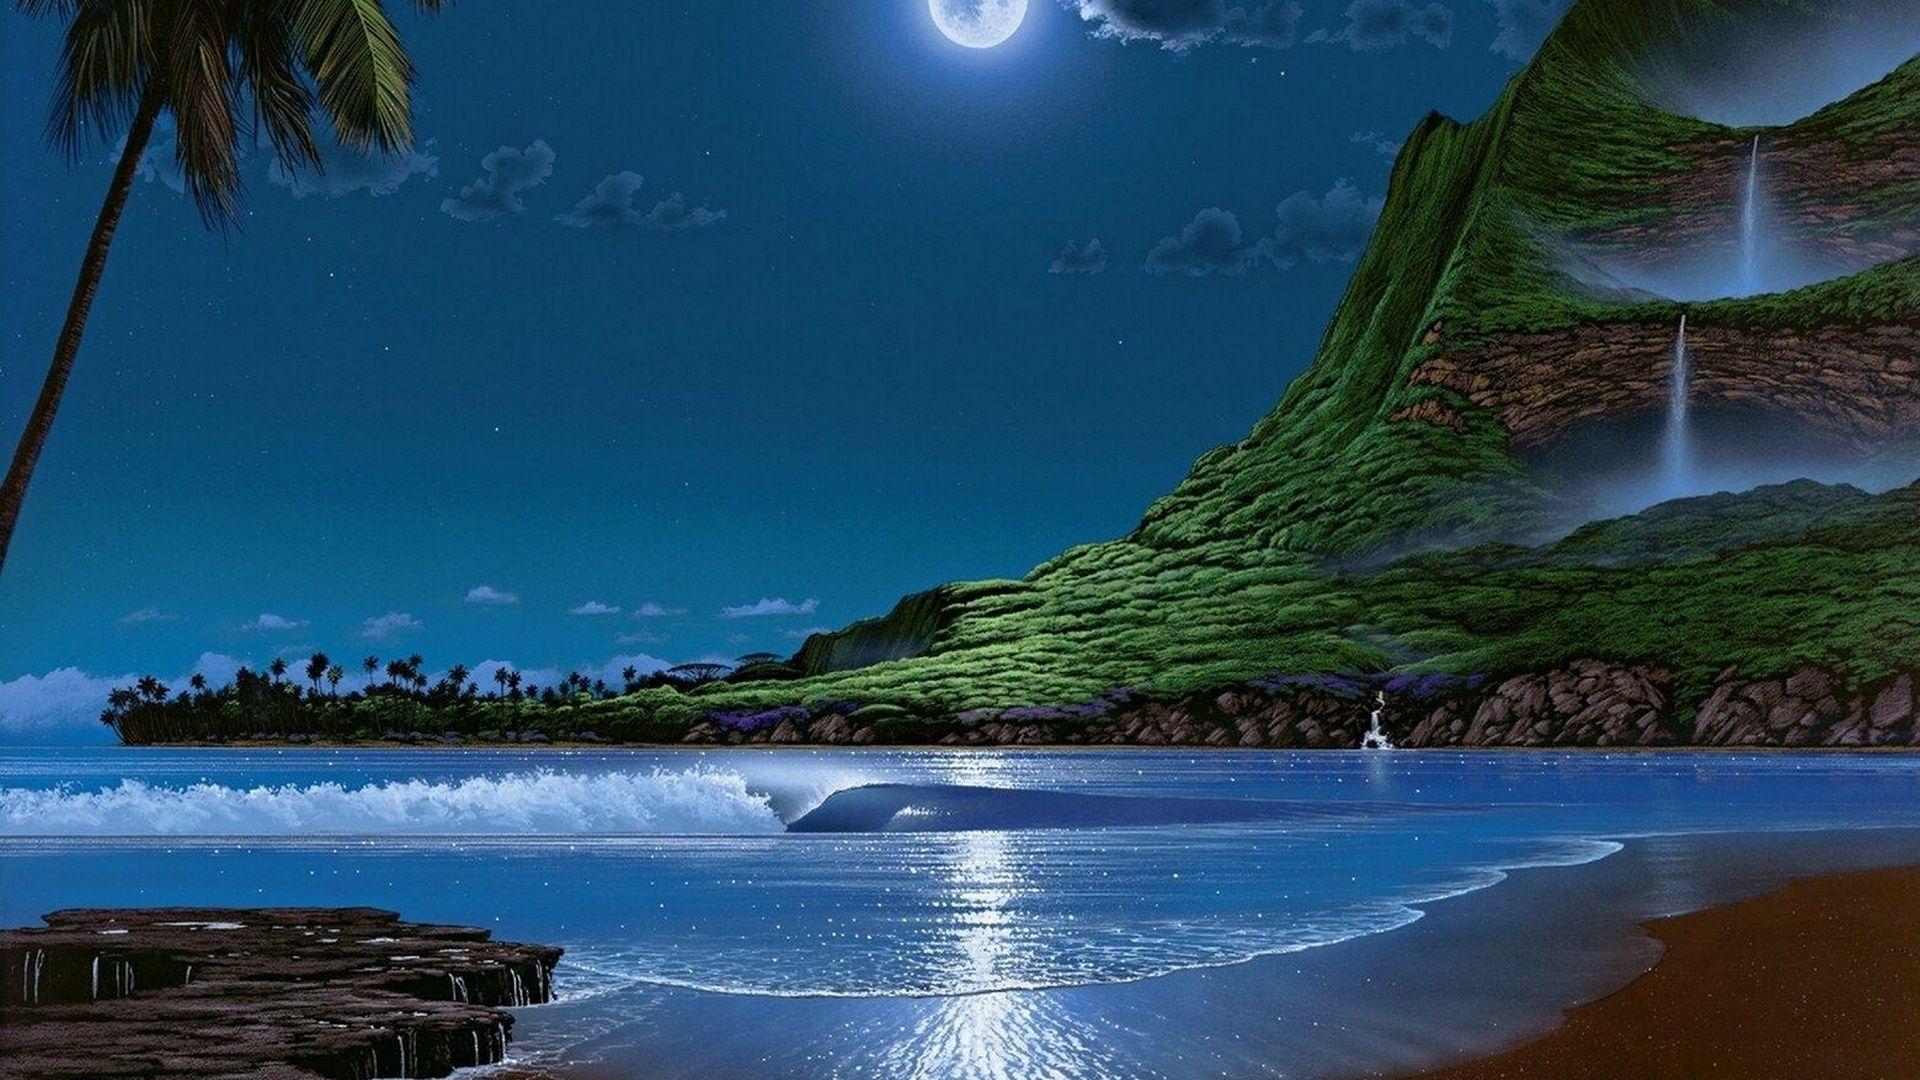 Amazing Fantasy World & Ocean Waves HD Wallpaper 1920x1080 HD | Wallpaper | Free animated ...